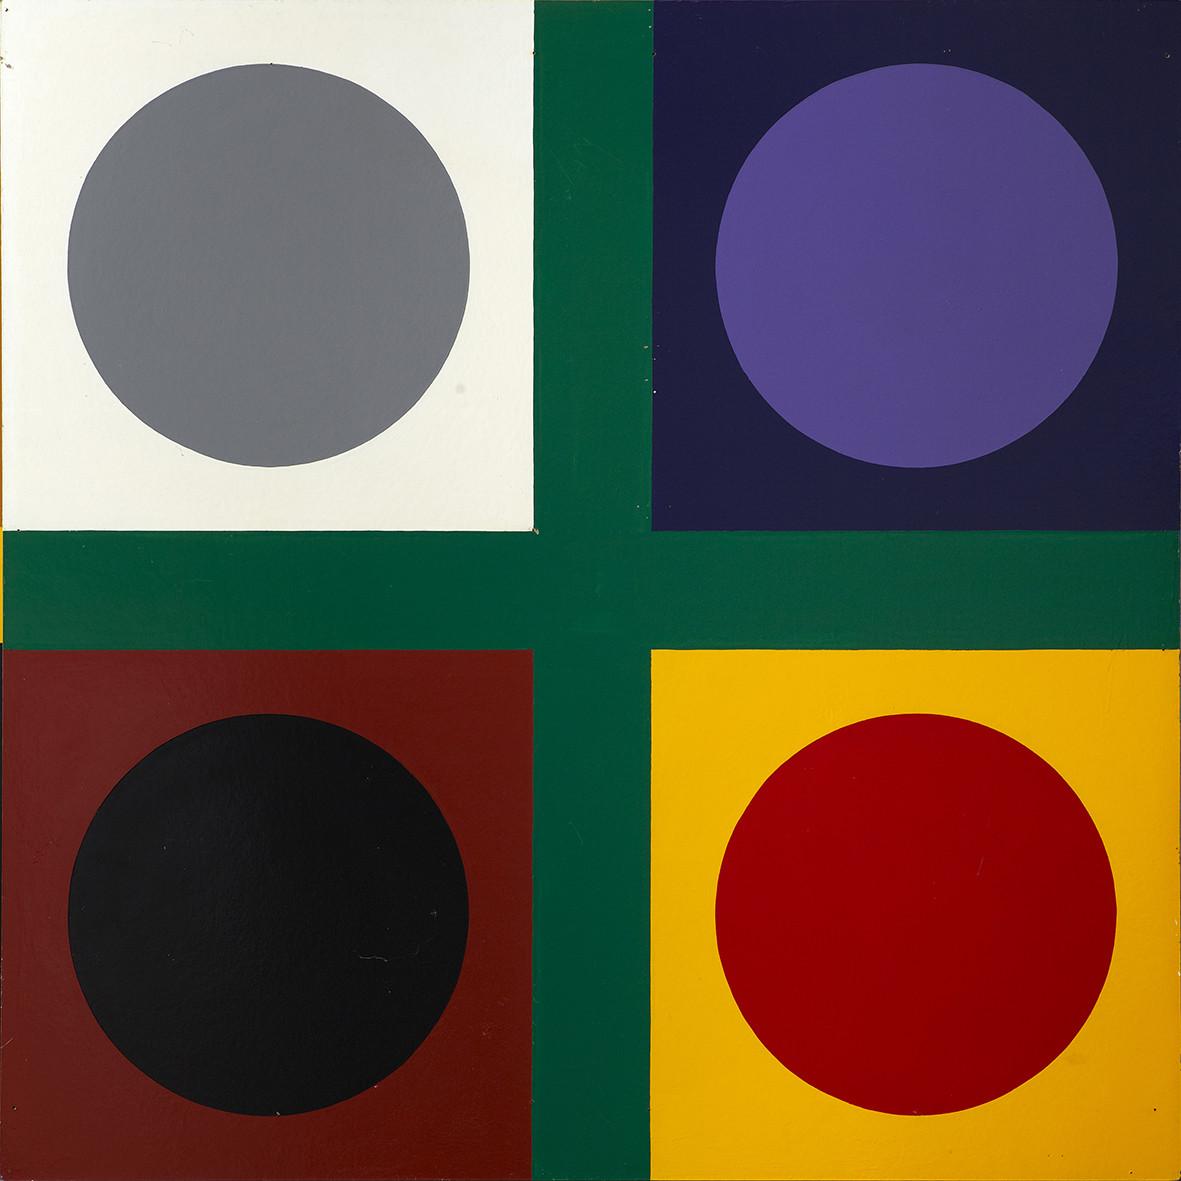 "<span class=""link fancybox-details-link""><a href=""/exhibitions/143/works/artworks11009/"">View Detail Page</a></span><div class=""artist""><strong> Poul Gernes</strong></div><div class=""title""><em>Untitled (tic tac toe painting)</em>, 1967</div><div class=""medium"">enamel paint on masonite</div><div class=""dimensions"">160.0 x 160.0 cm<br>62 15/16 x 62 15/16 in</div>"